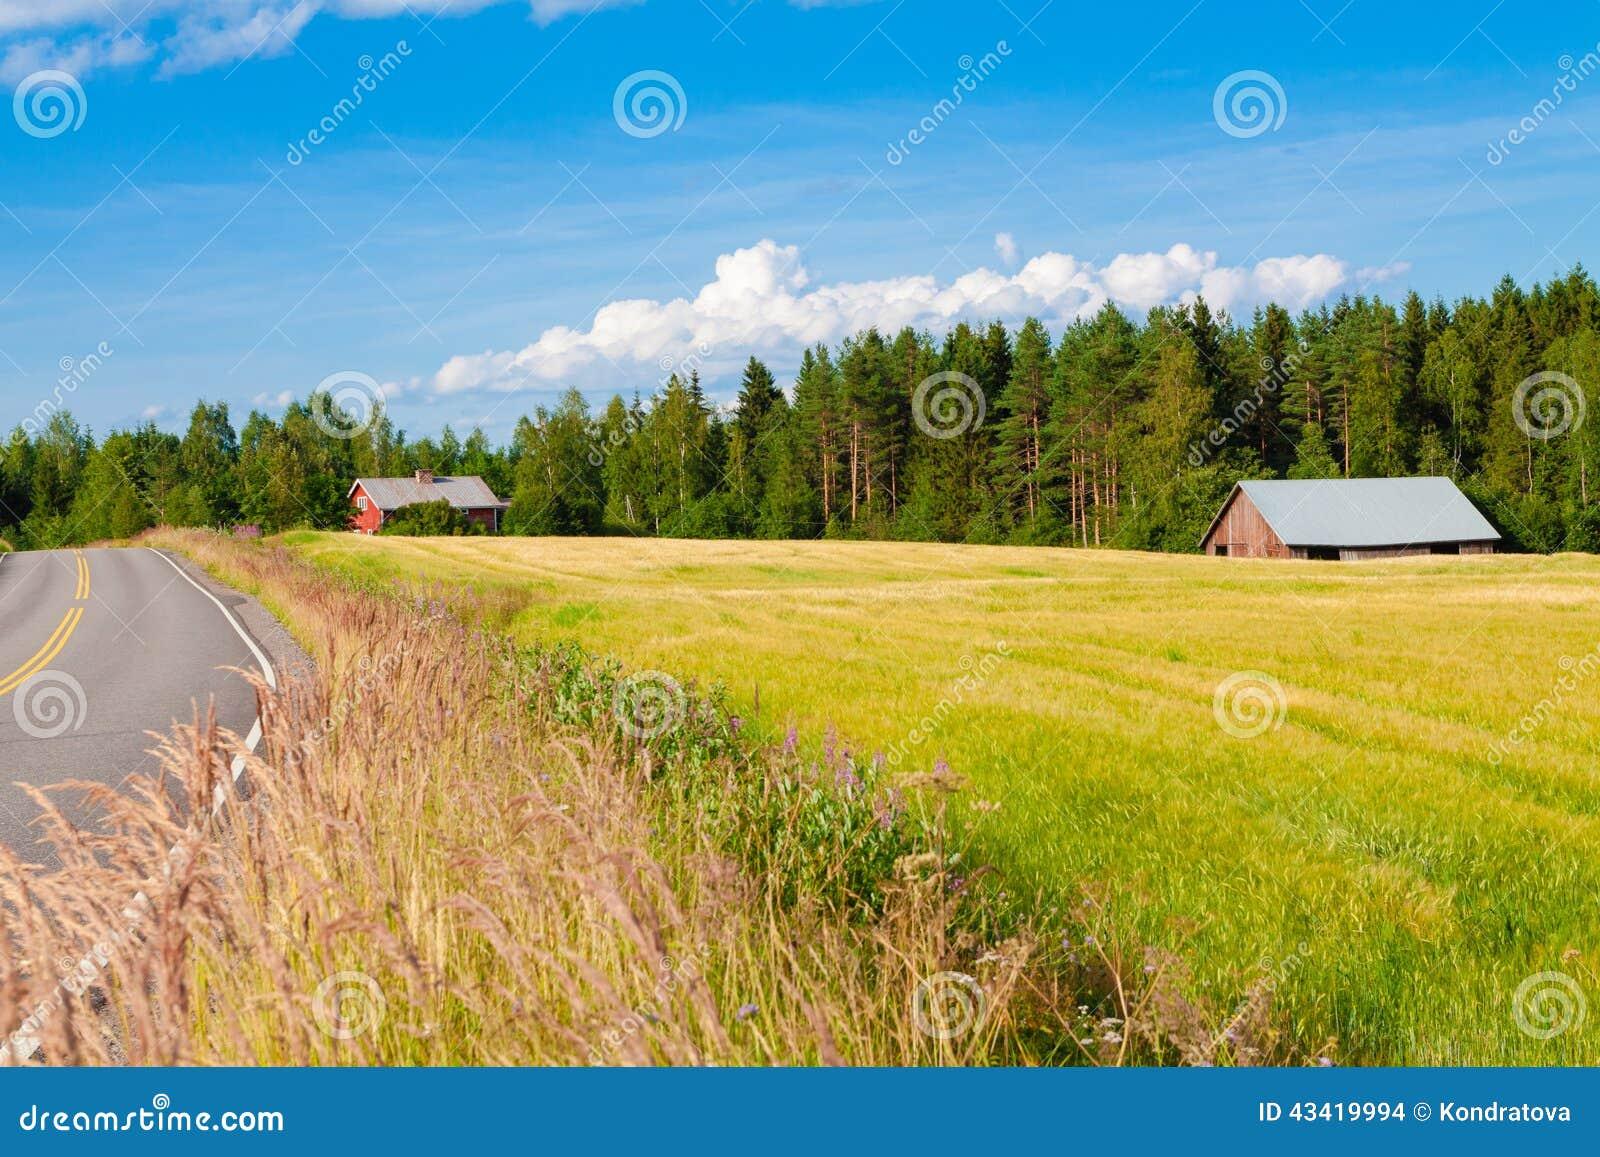 Rood landbouwbedrijf met de weg, de blauwe hemel en het groene gebied